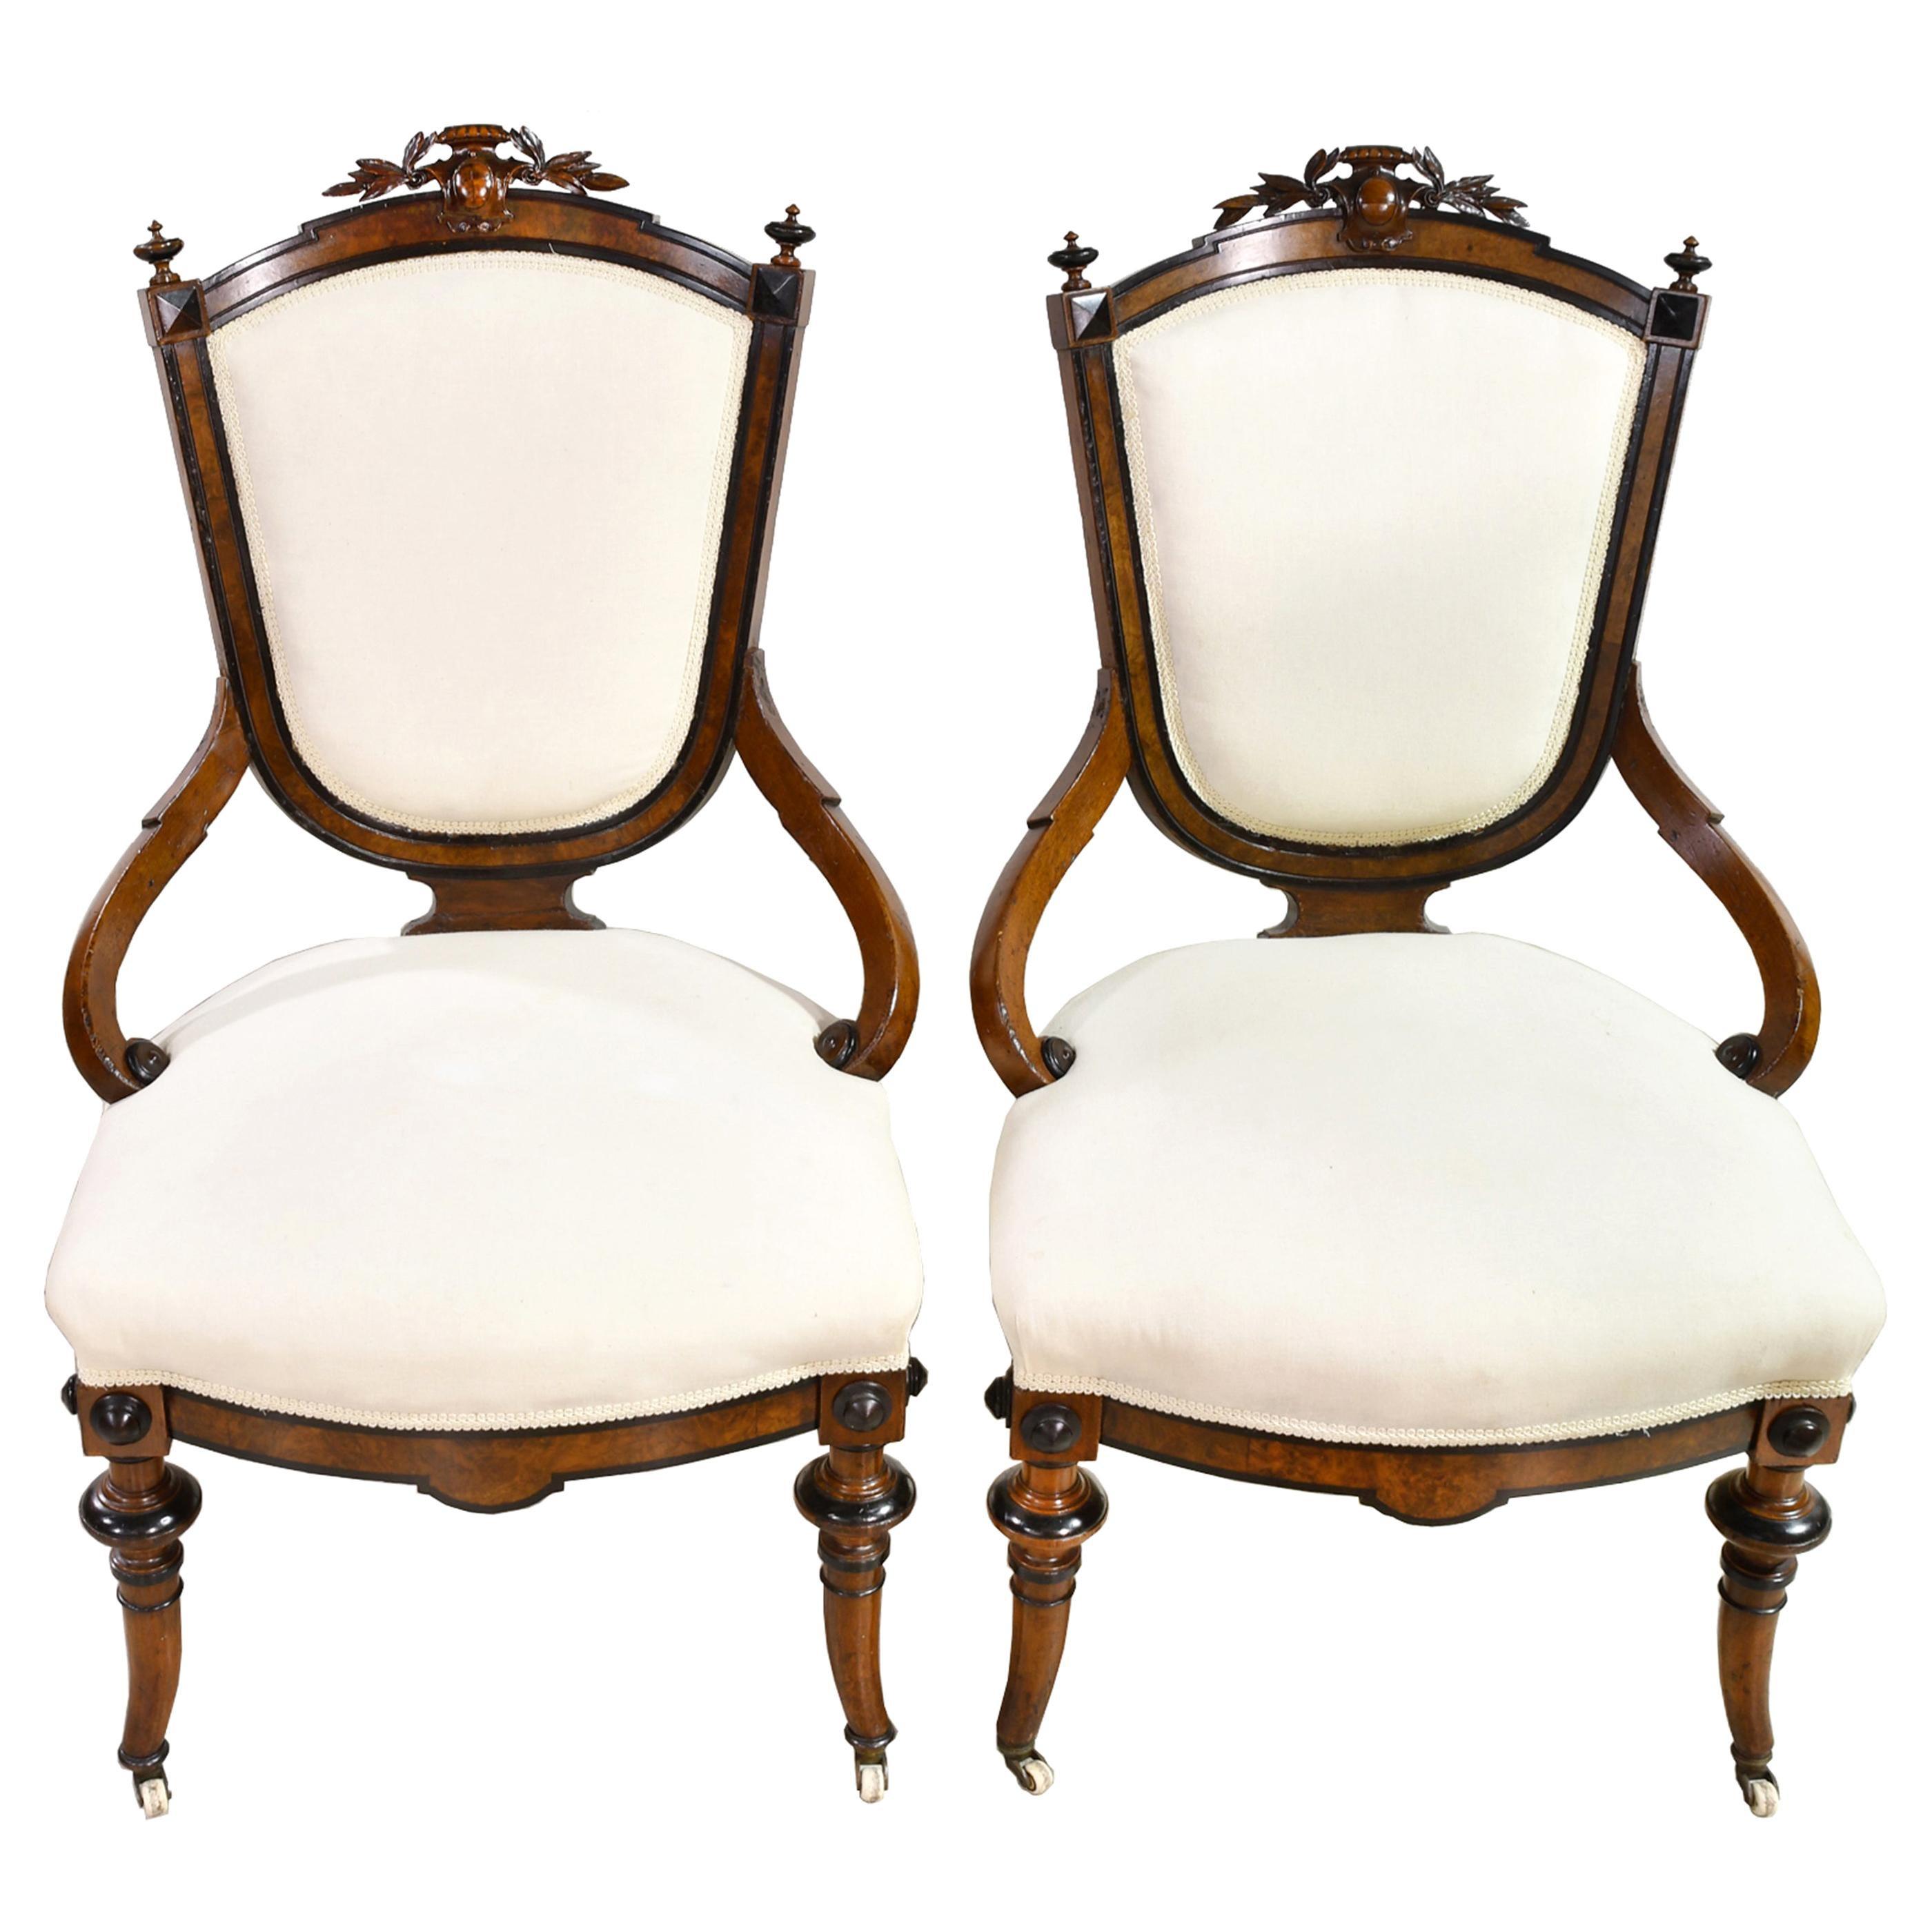 Pair of Napoleon III Upholstered Armchairs in Ebonized & Burl Walnut, circa 1870